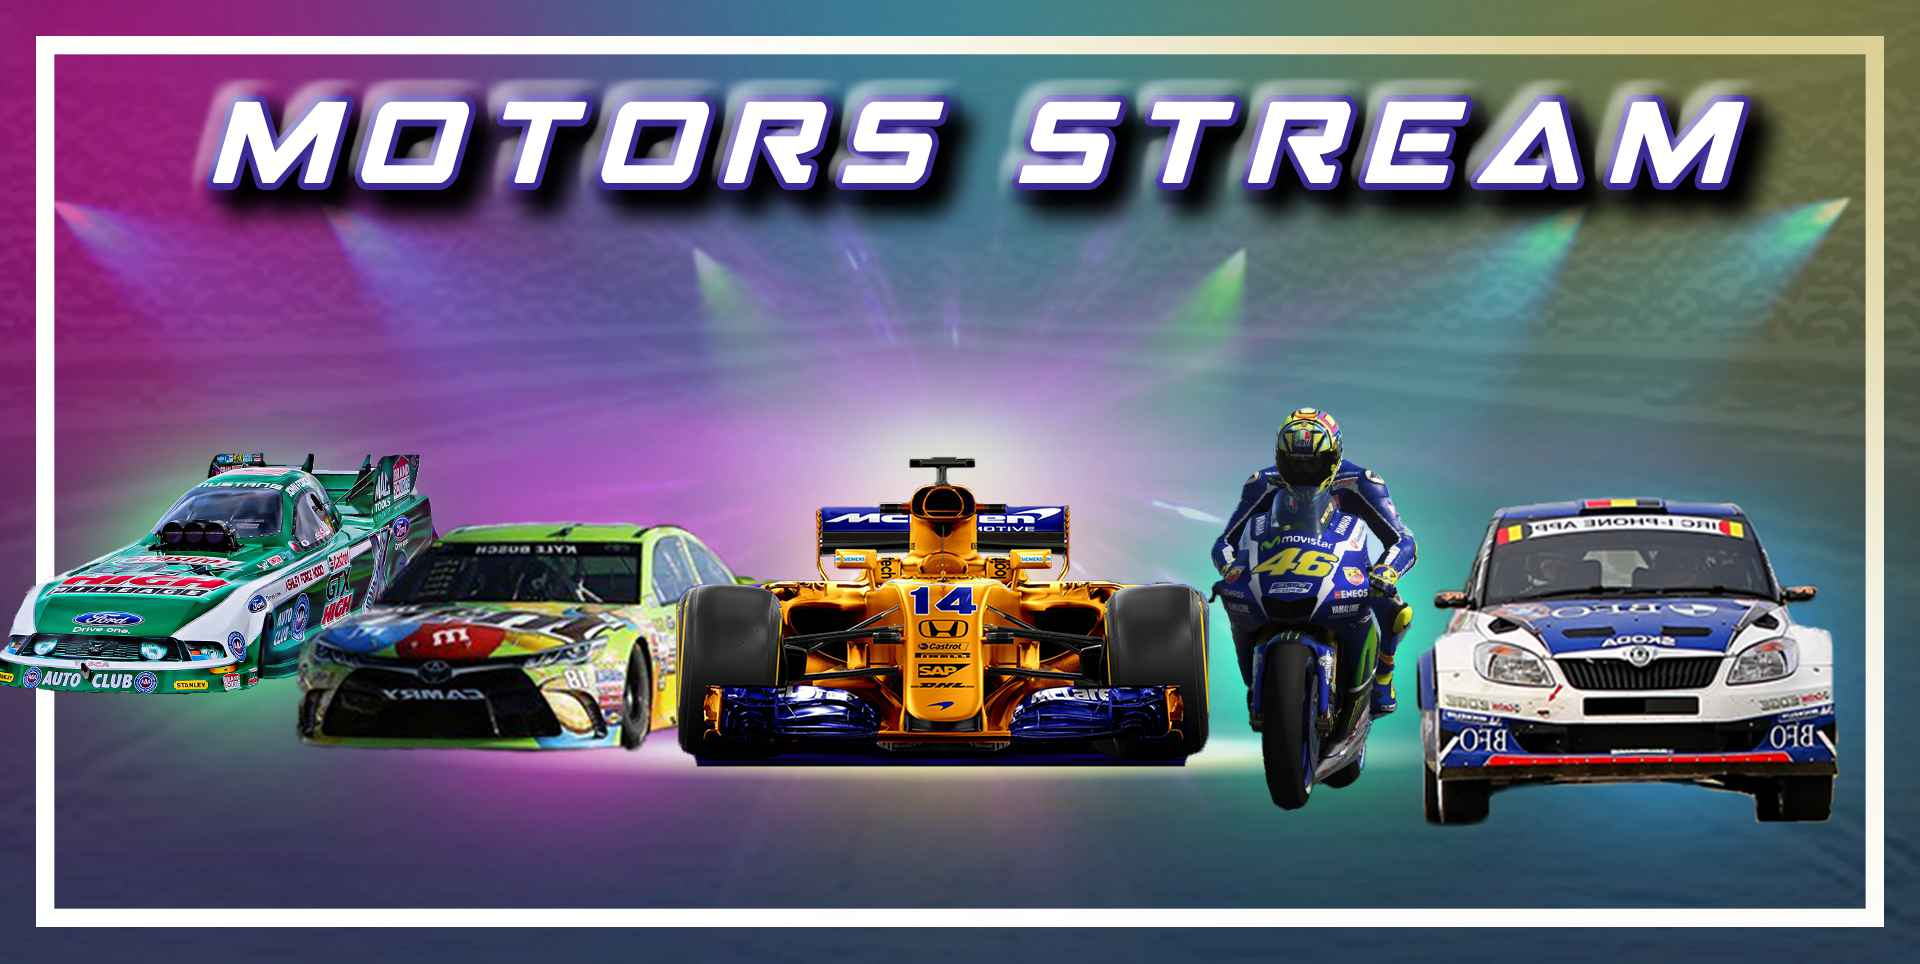 United States GP Live stream 2018